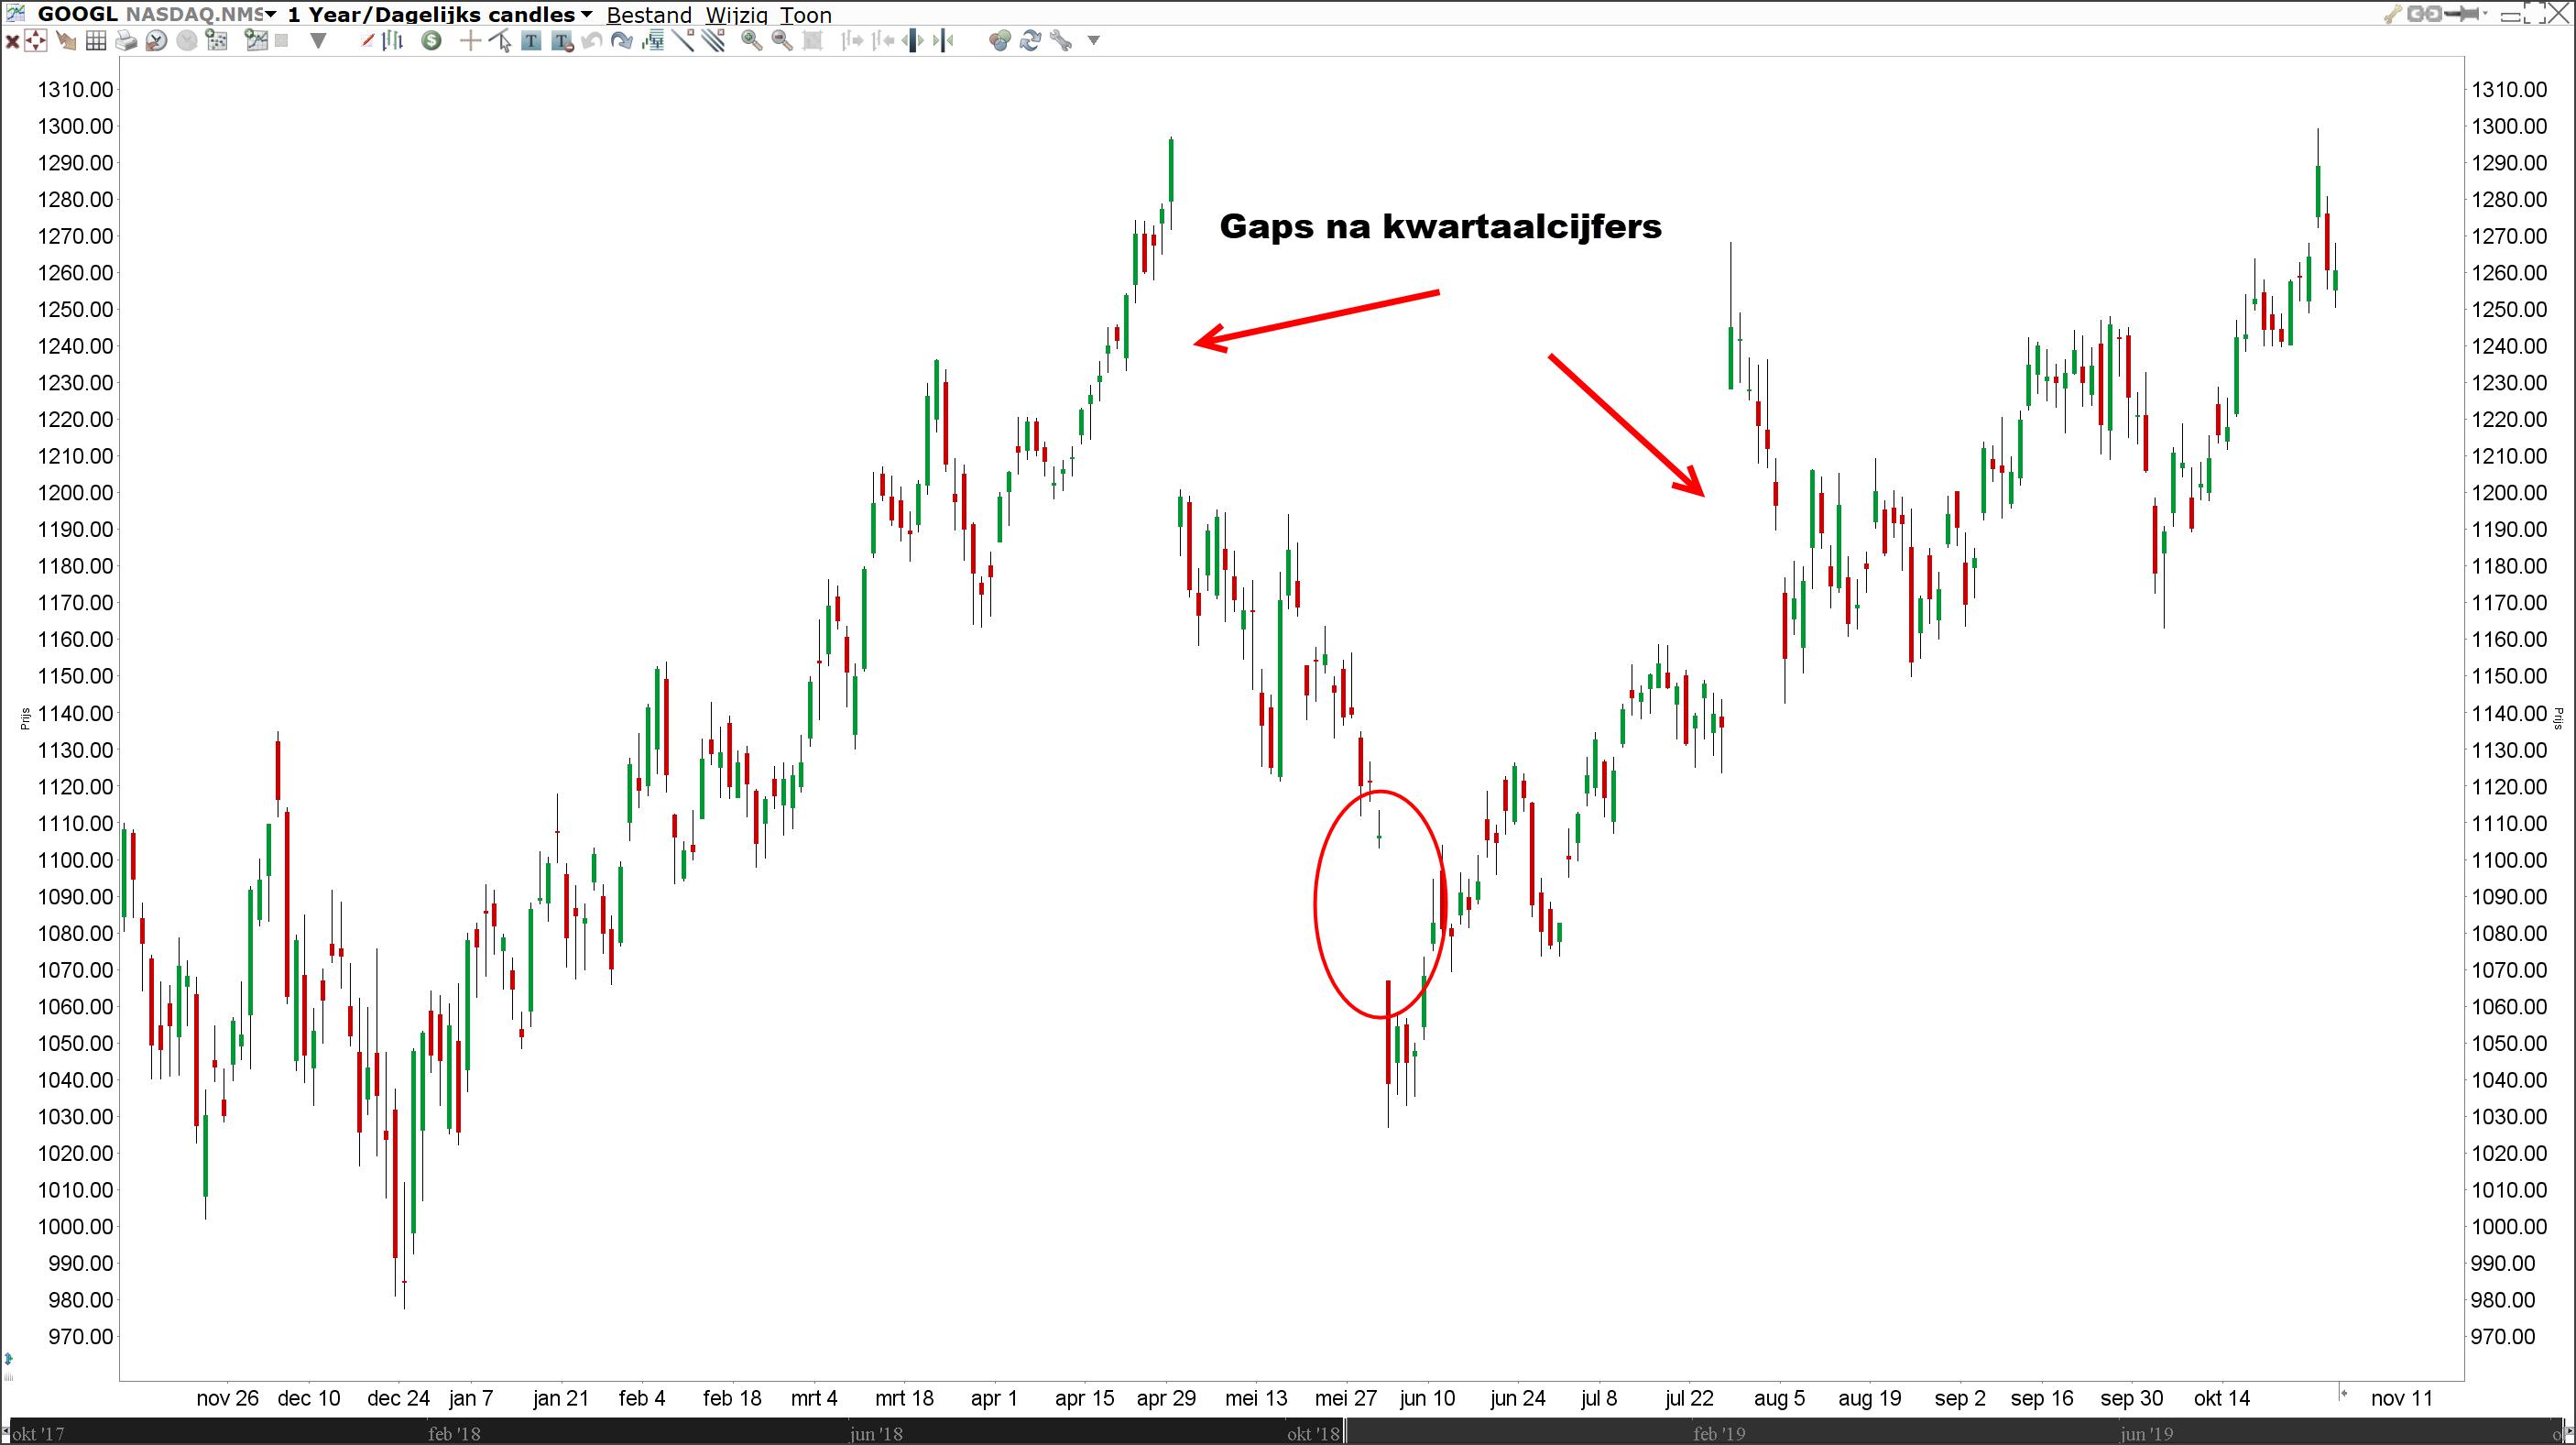 Kwartaalcijfers en gaps | Gap trading